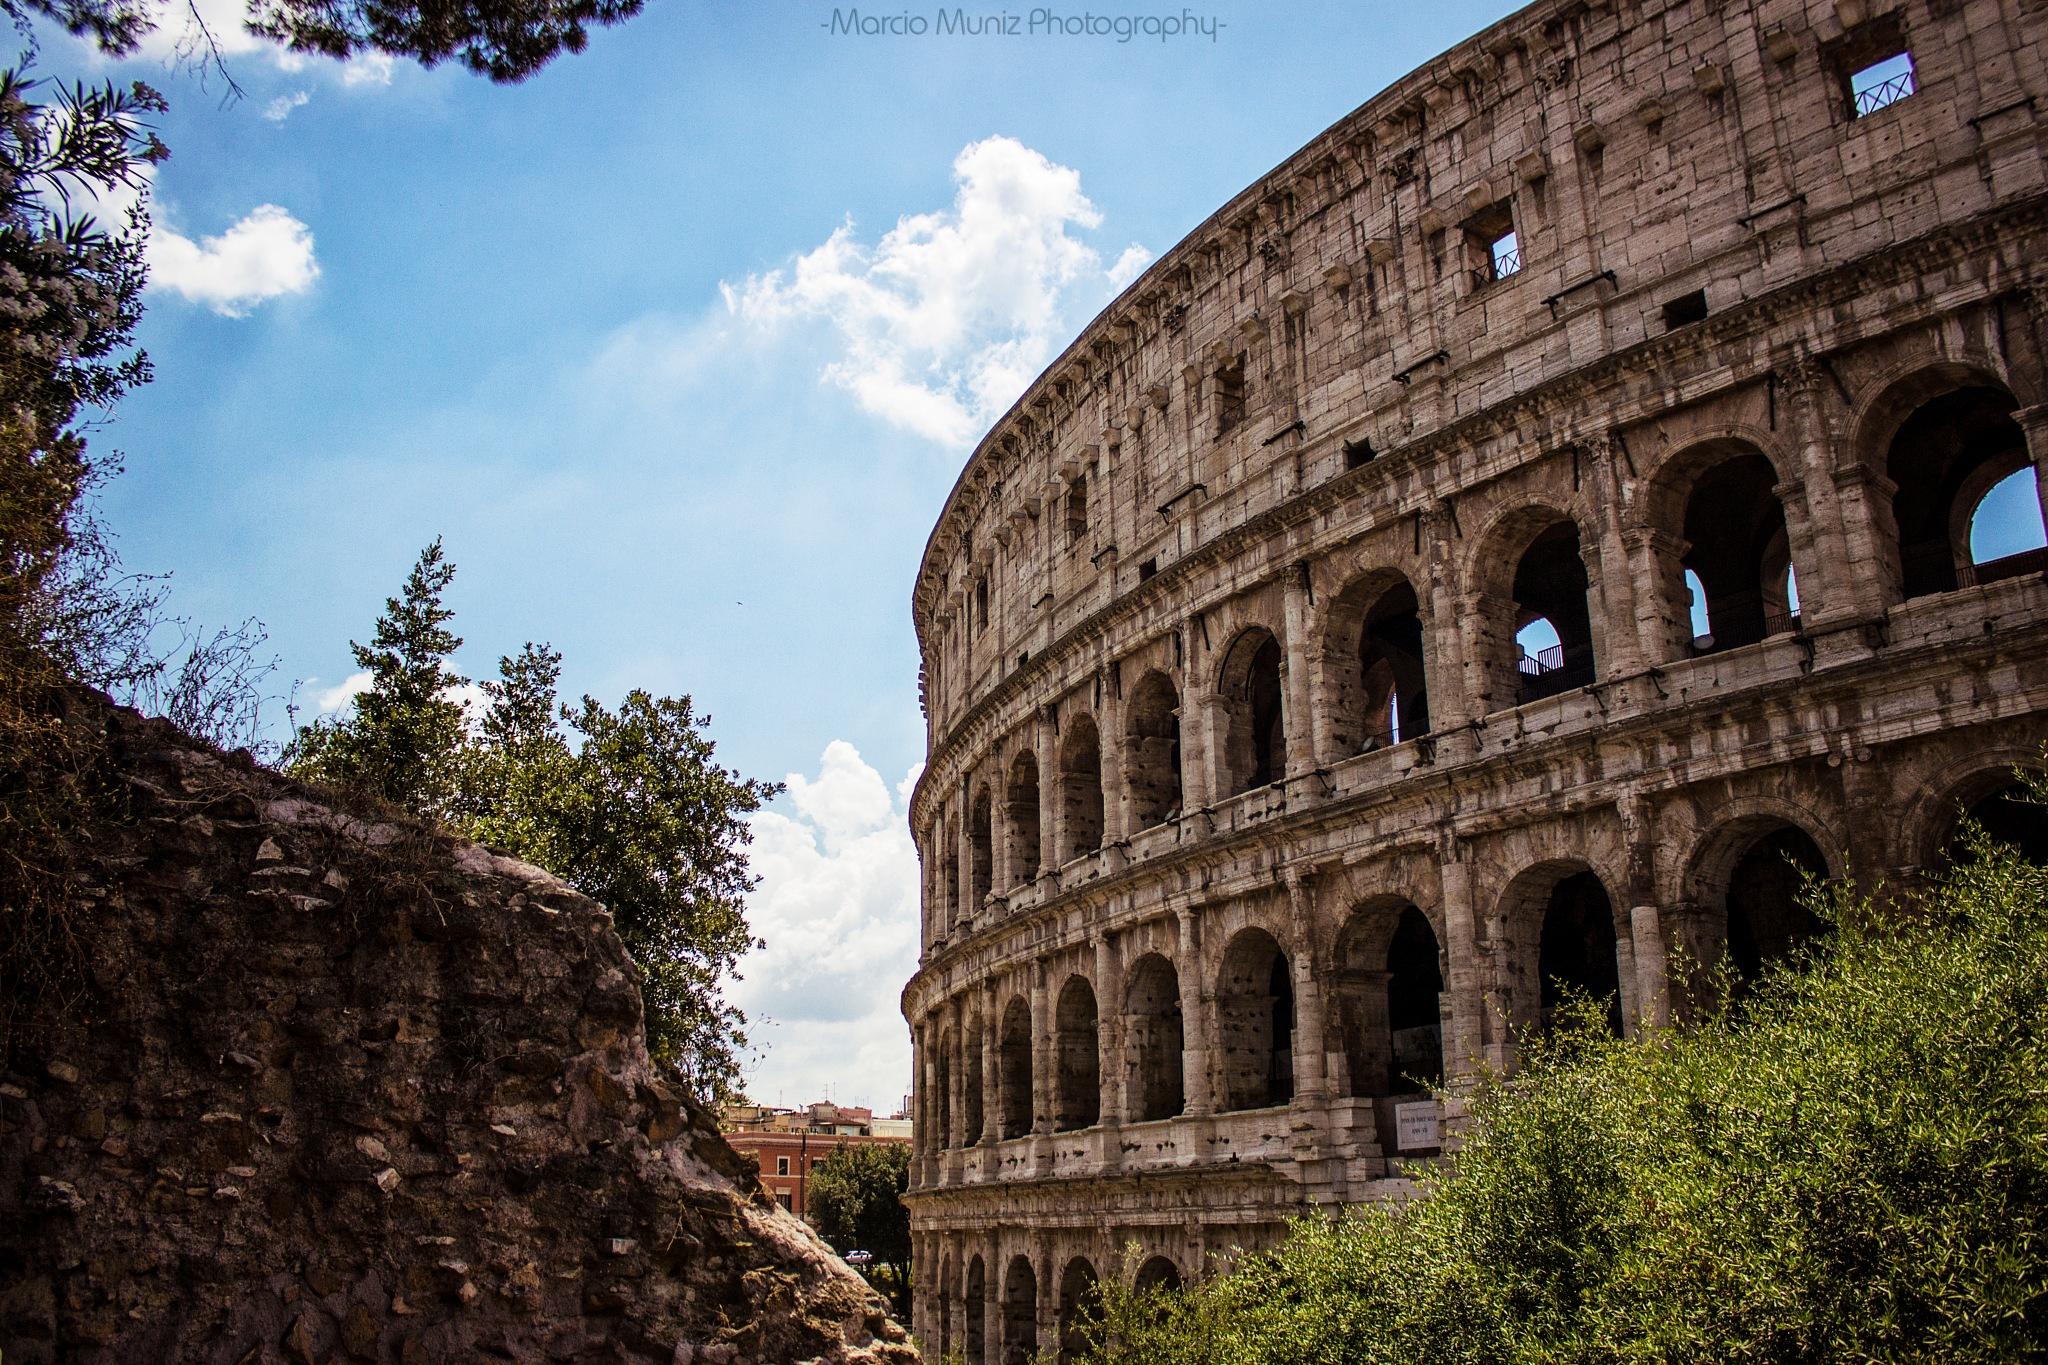 Colosseum by Marcio Muniz